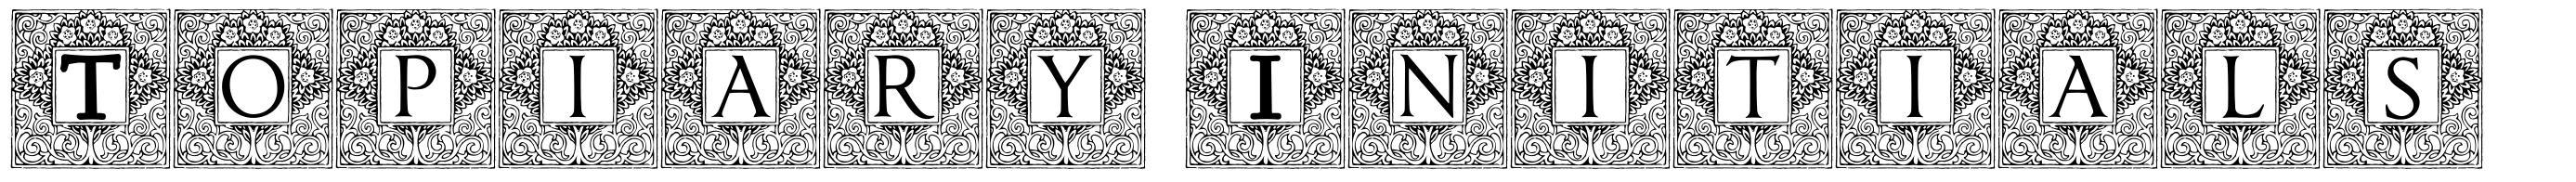 Topiary Initials font